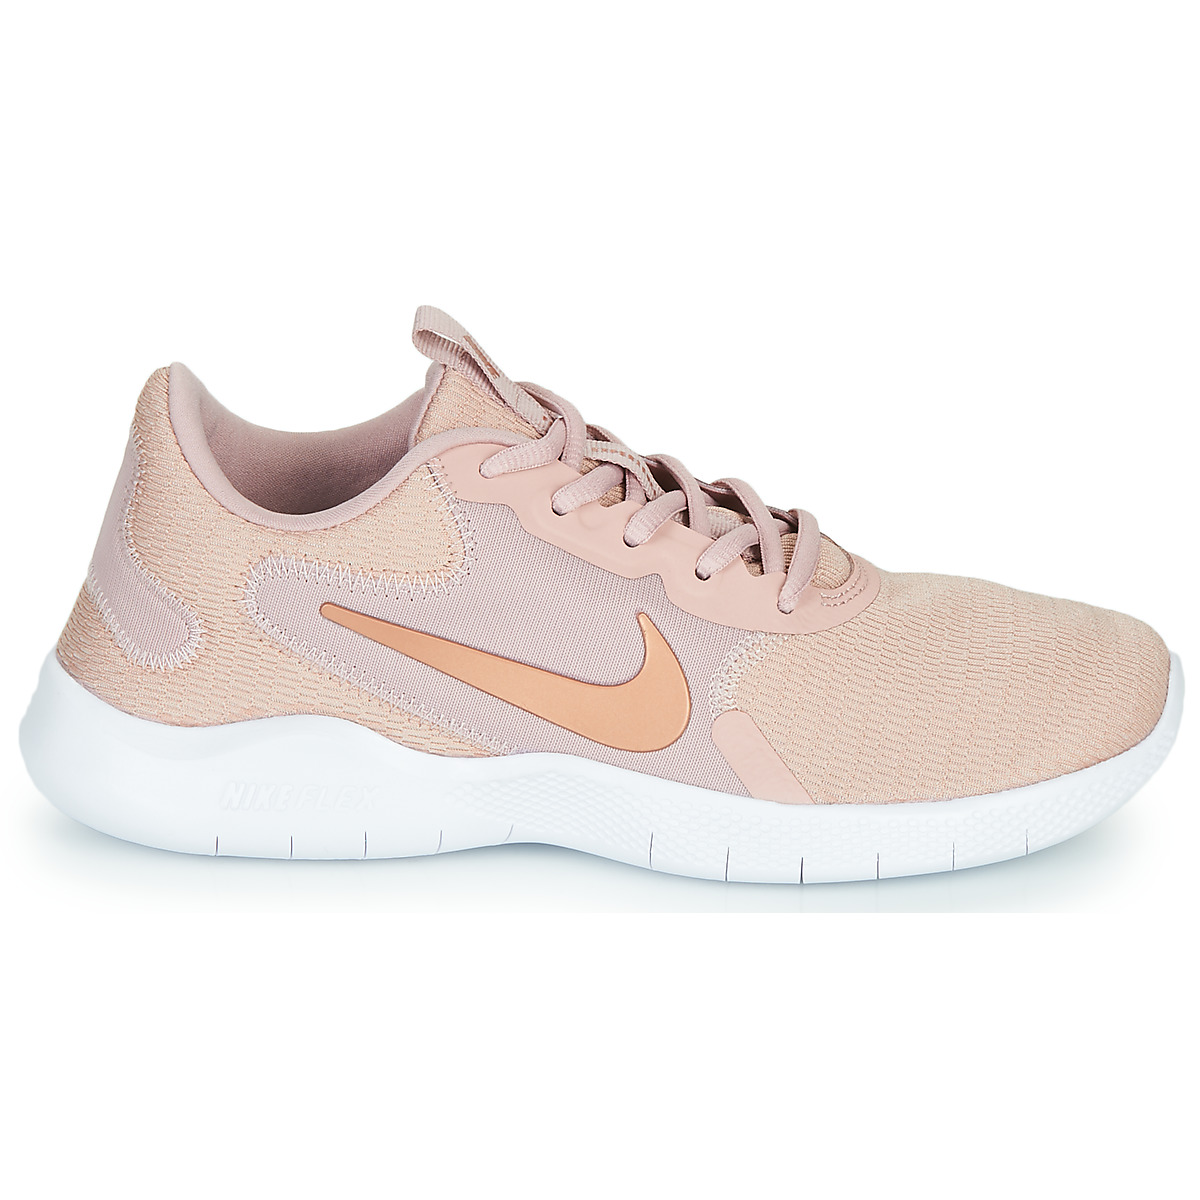 Nike FLEX EXPERIENCE RUN 9 Rosa 16774267 Consegna Gratuita